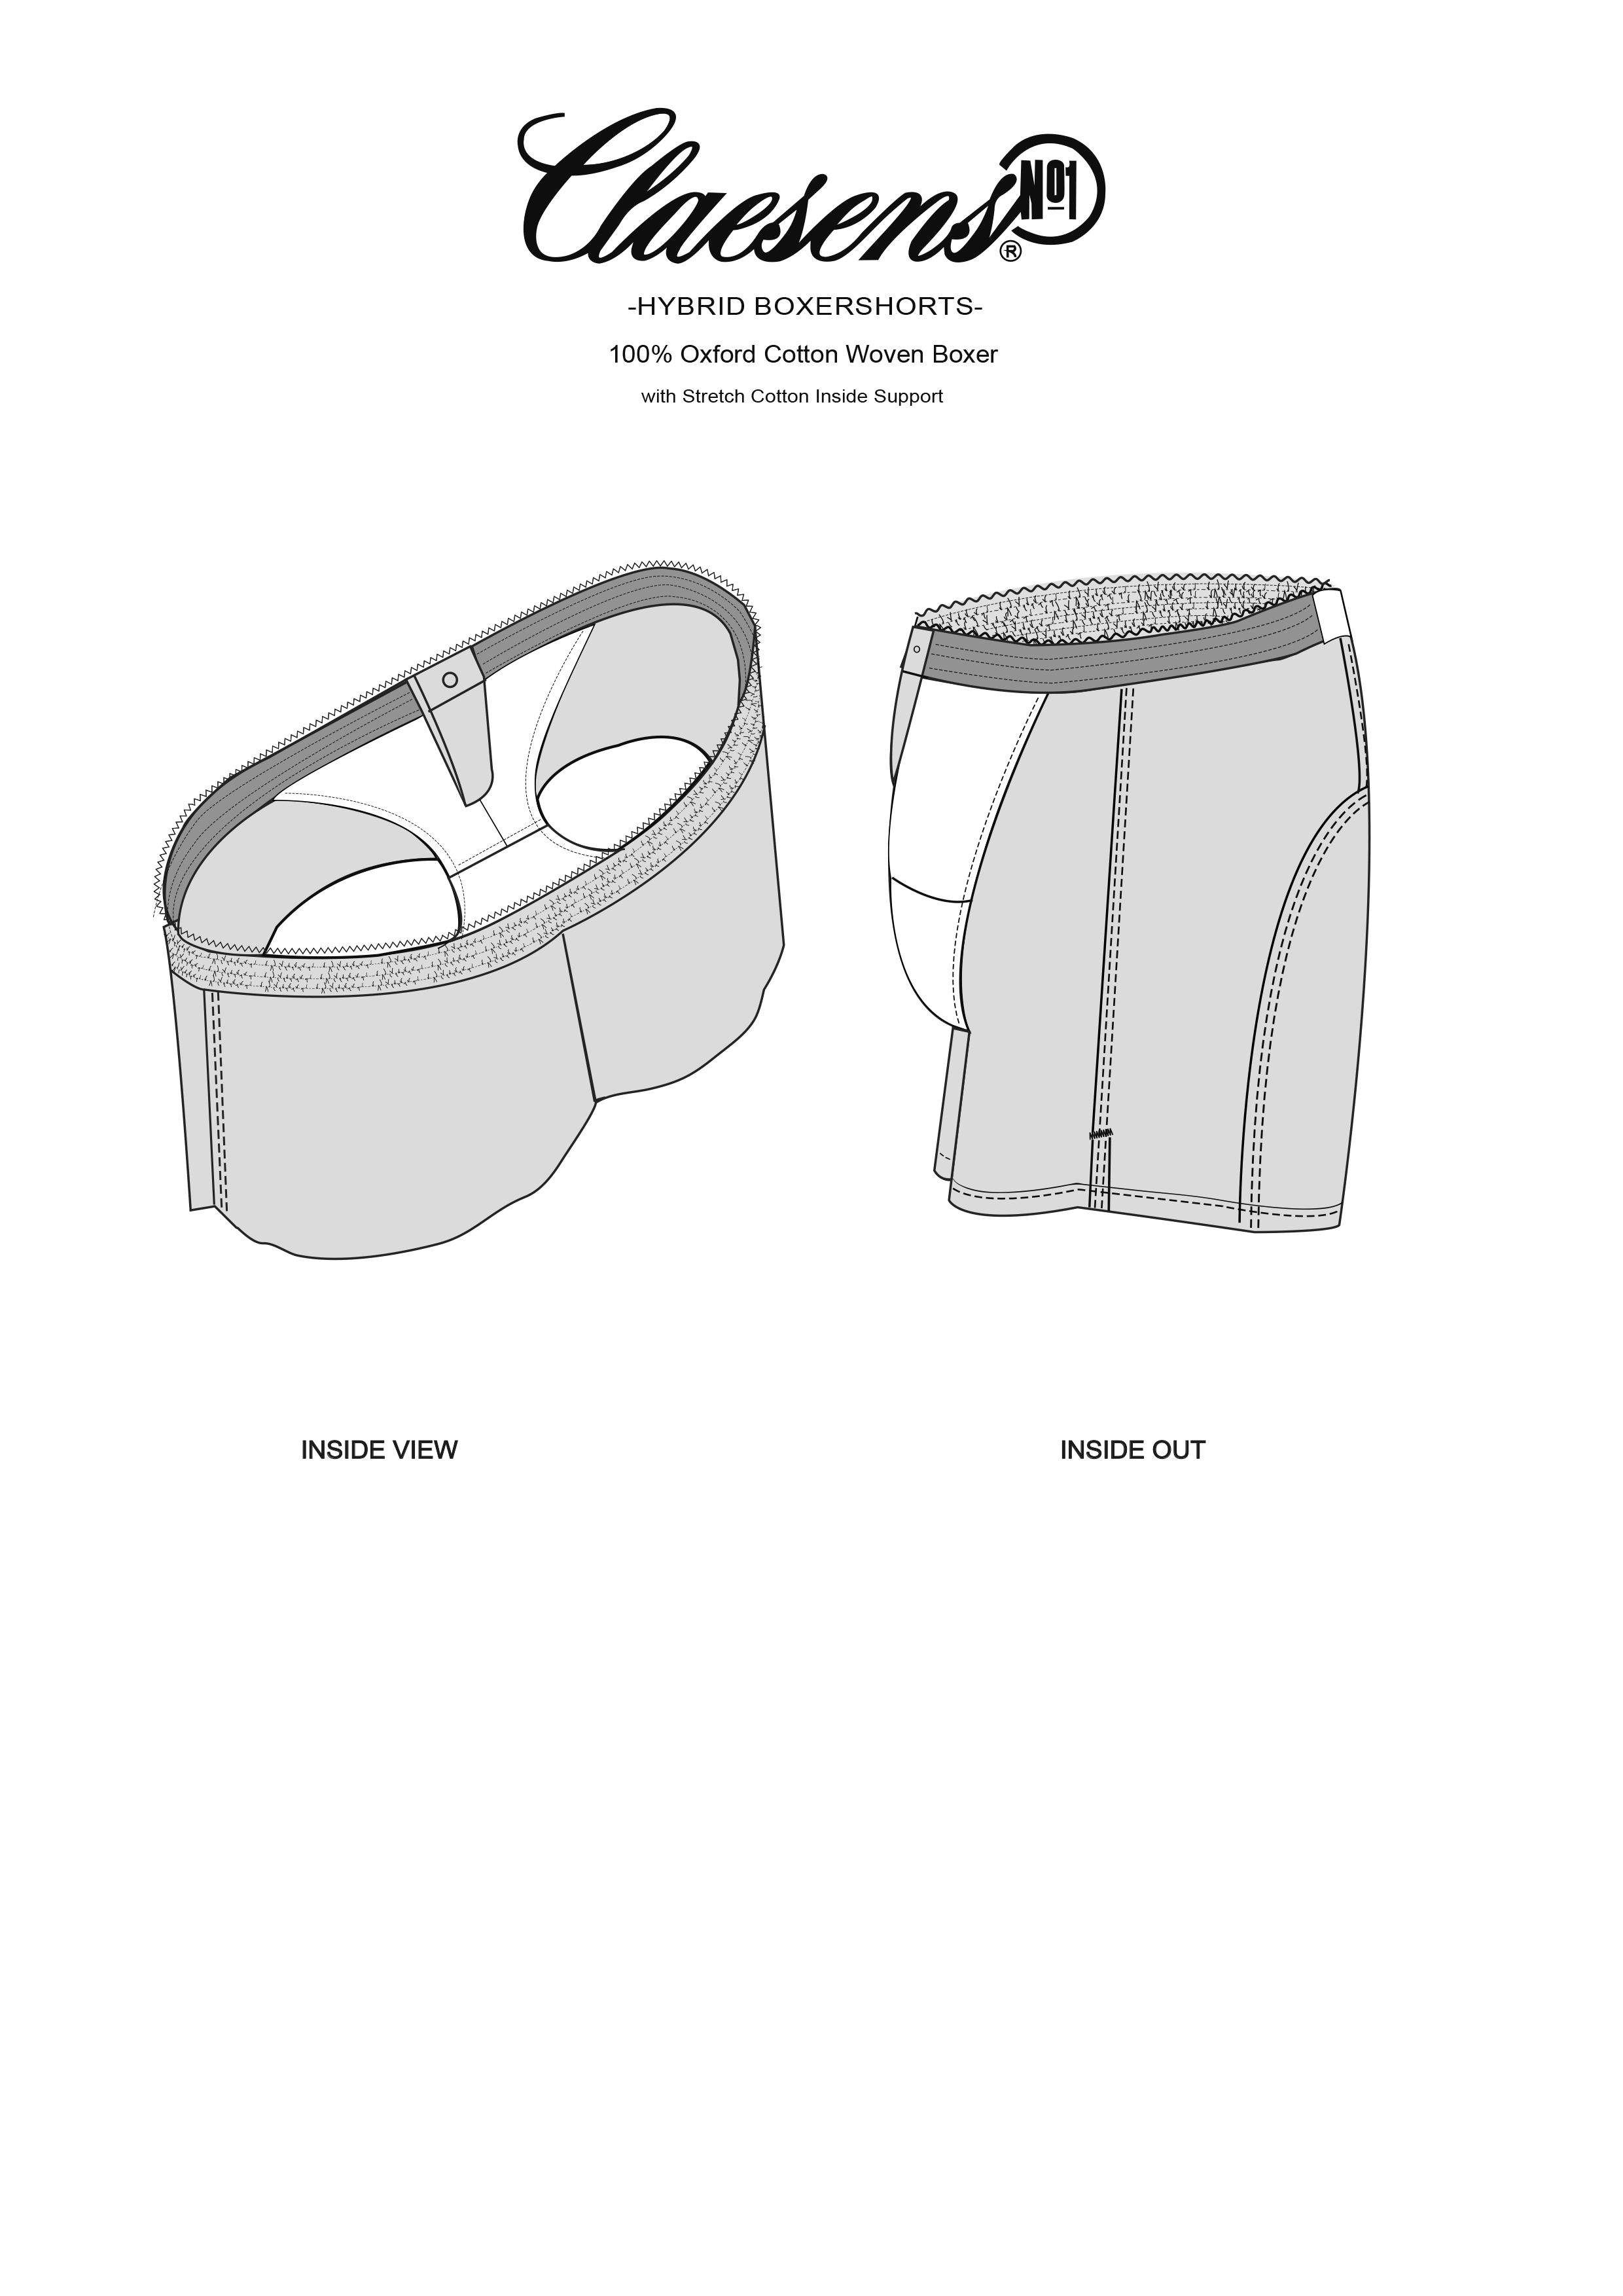 Woven 2 pack Hybride Boxer